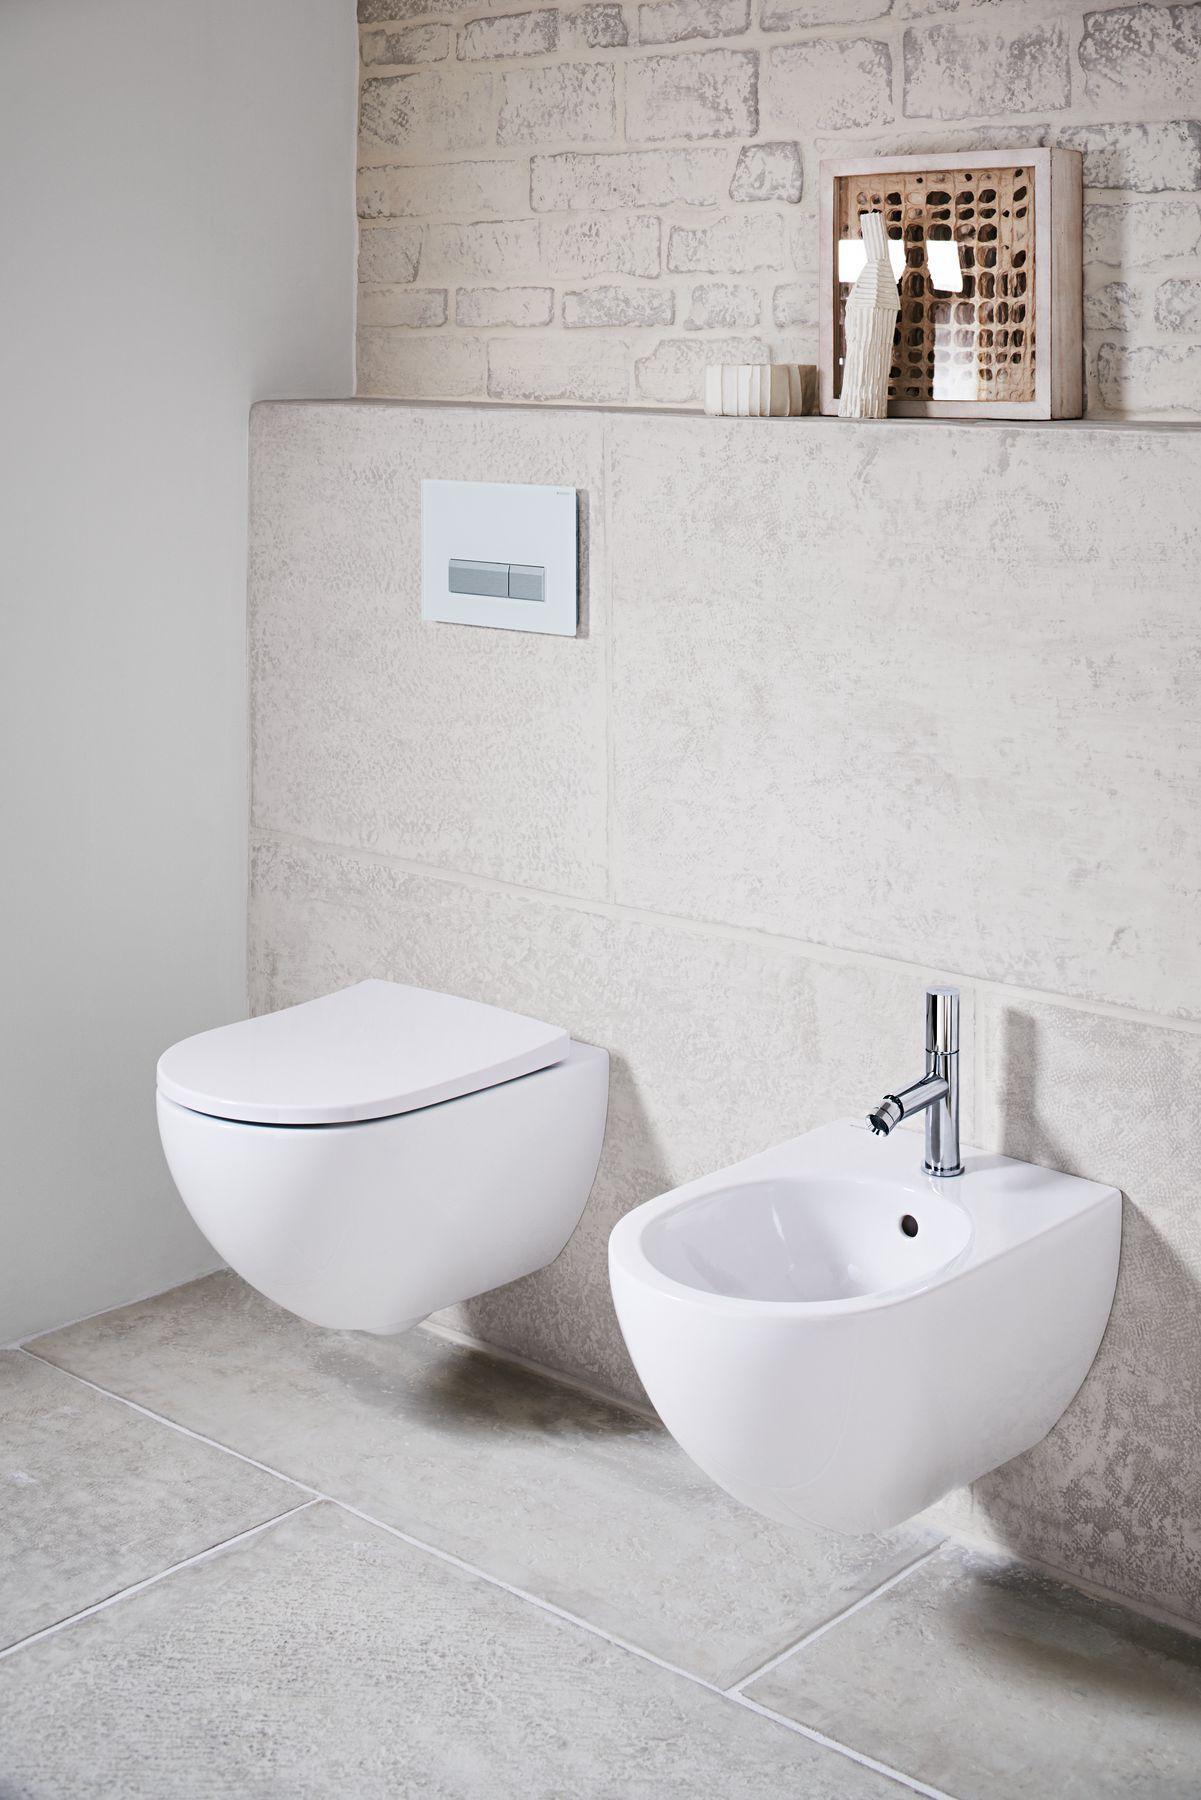 toilette keramag great keramag renova nr comfort wei with toilette keramag finest hang. Black Bedroom Furniture Sets. Home Design Ideas